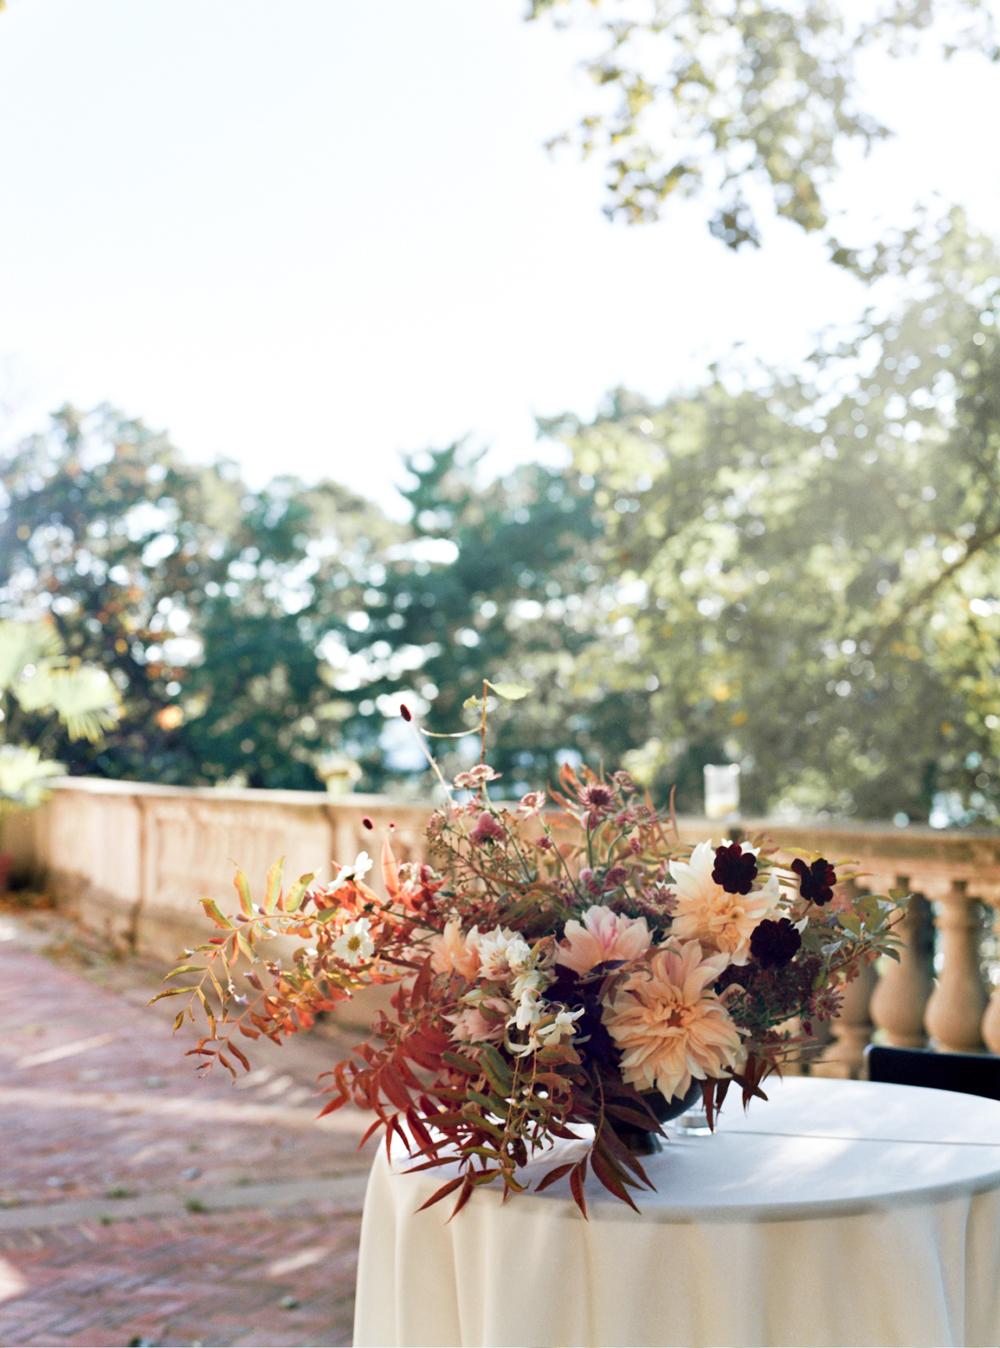 cristina-lozito-photography-flowers-30.jpg